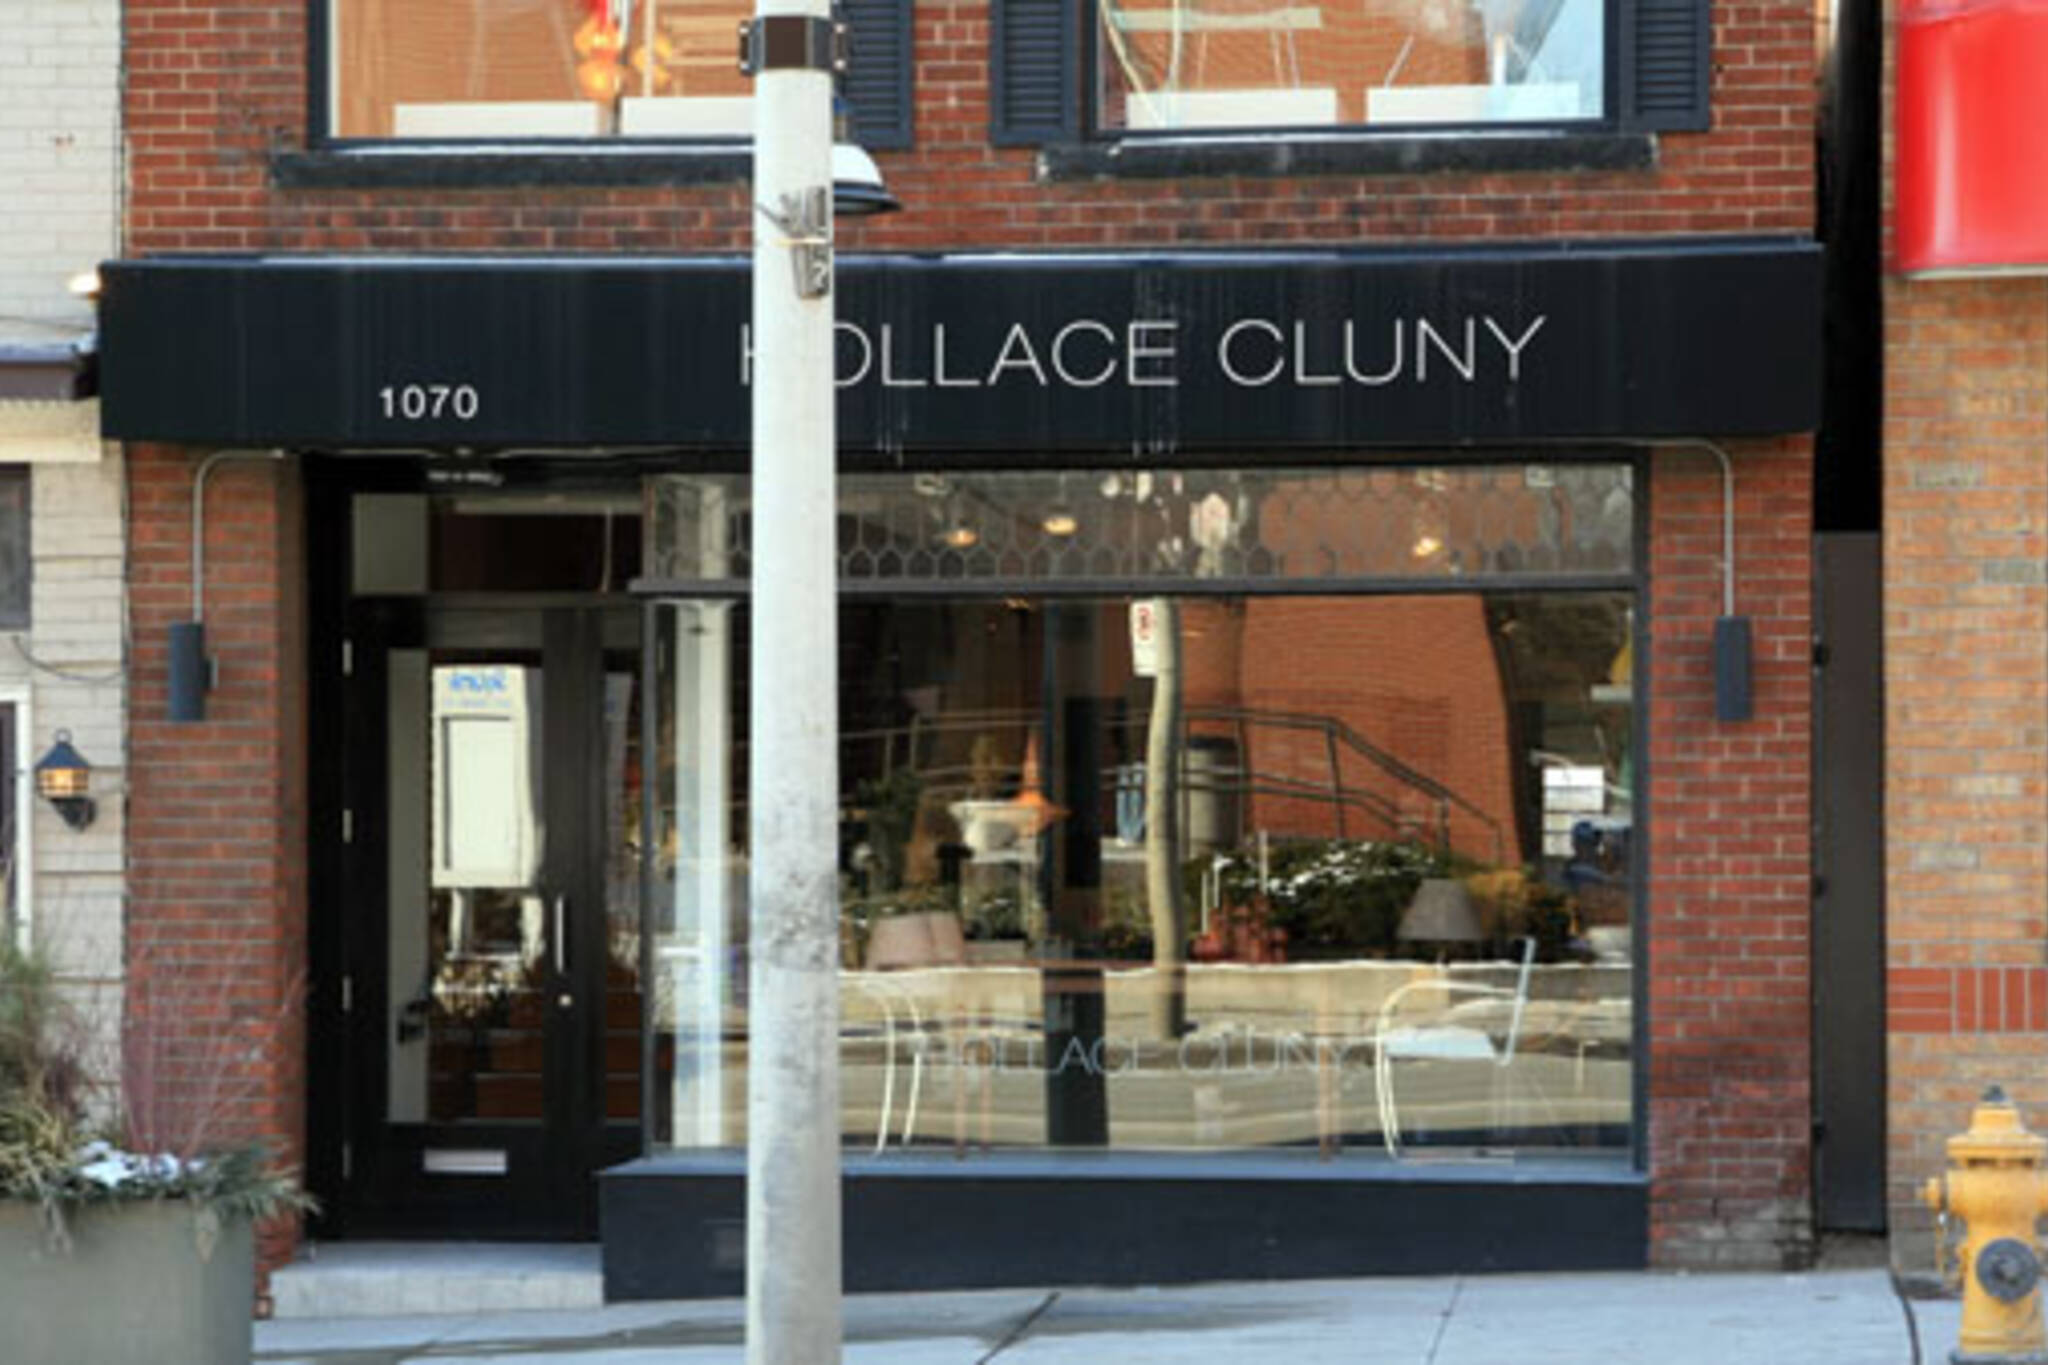 Hollace Cluny